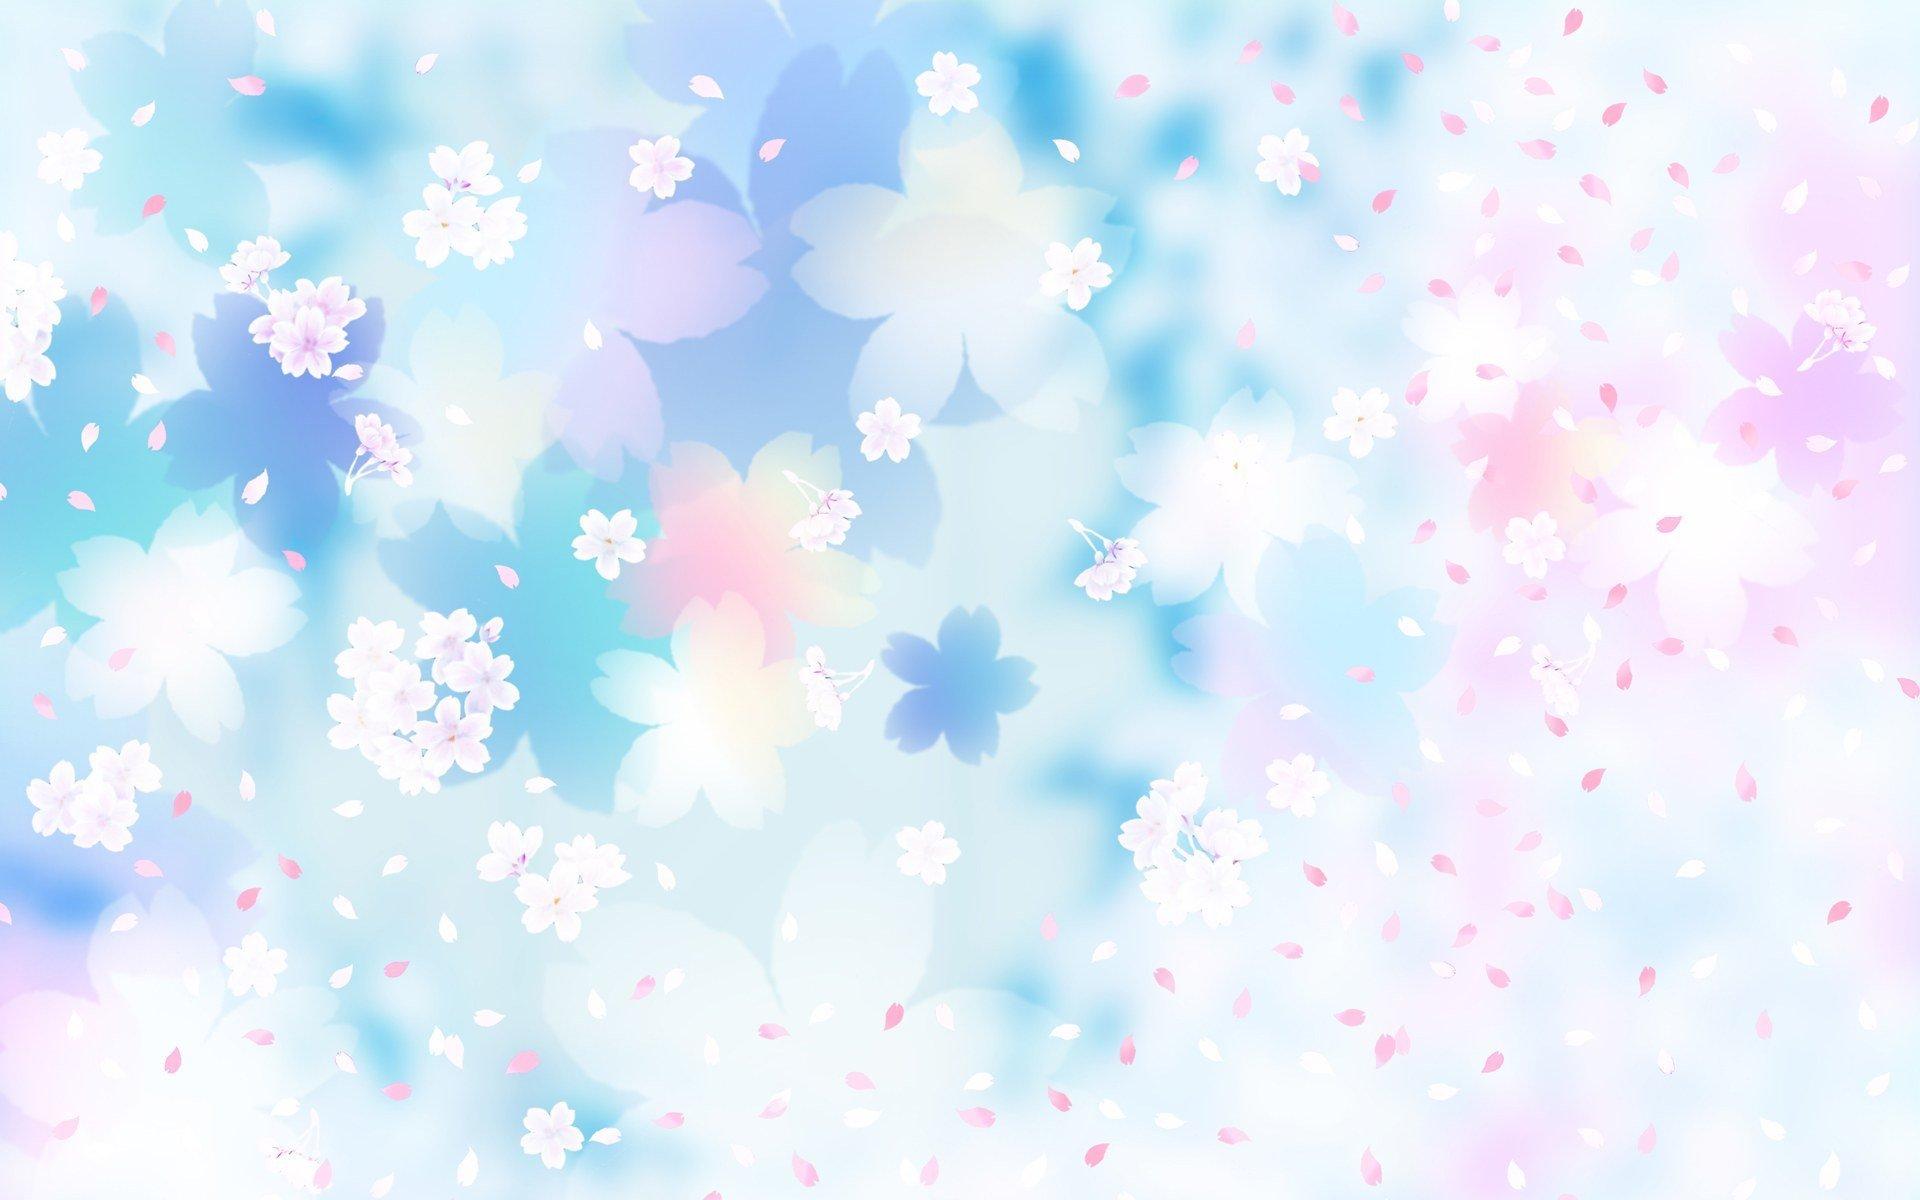 Hình background hoa